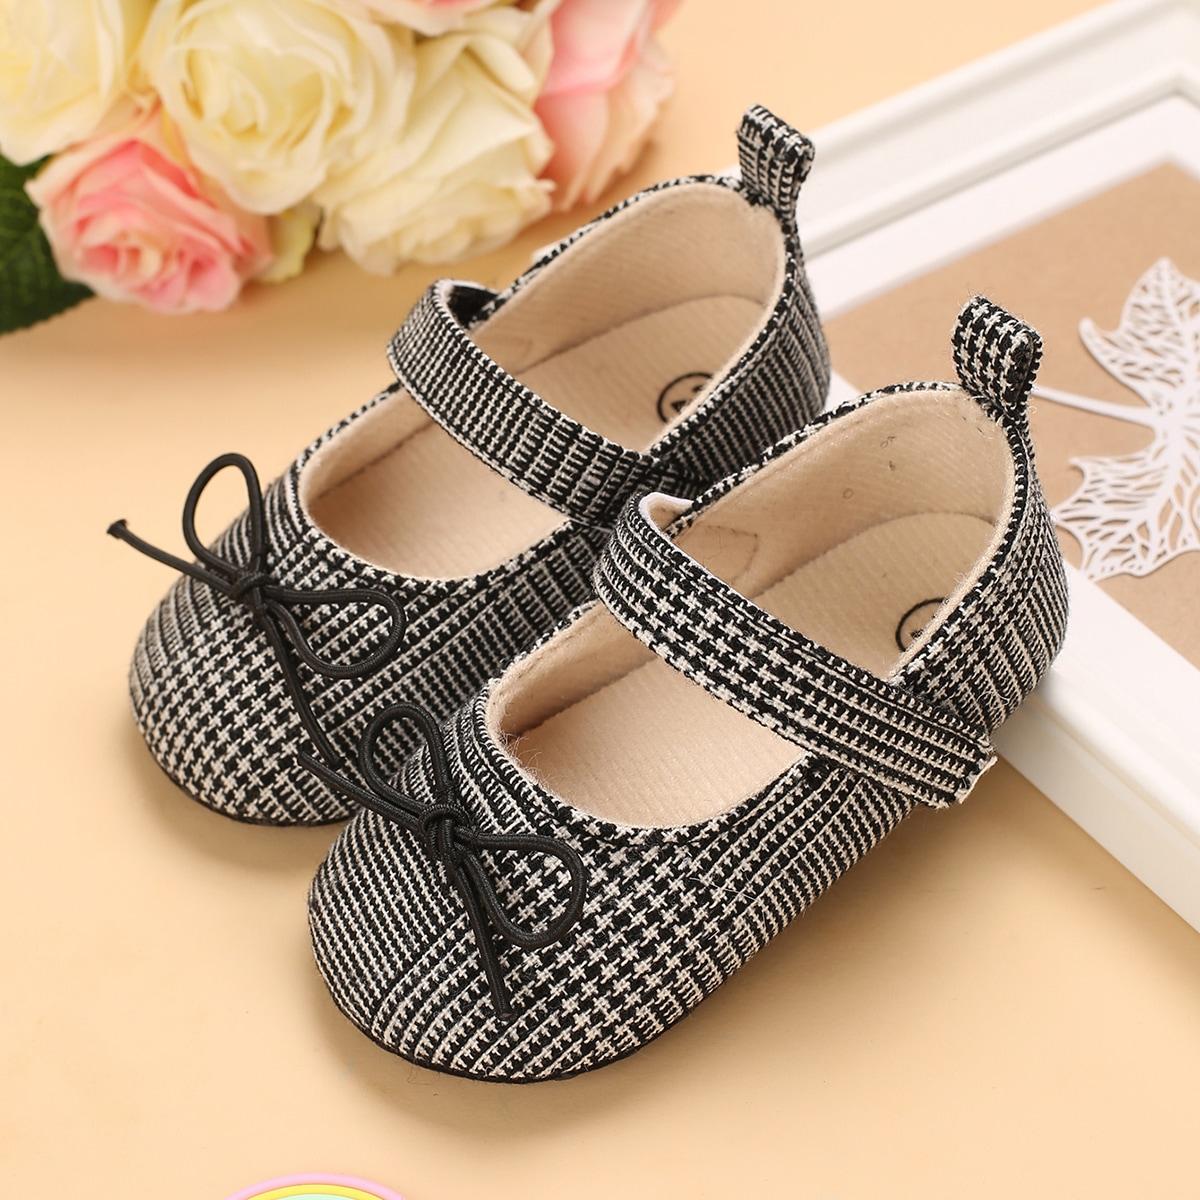 Zapatos planos para bebé mary Jane